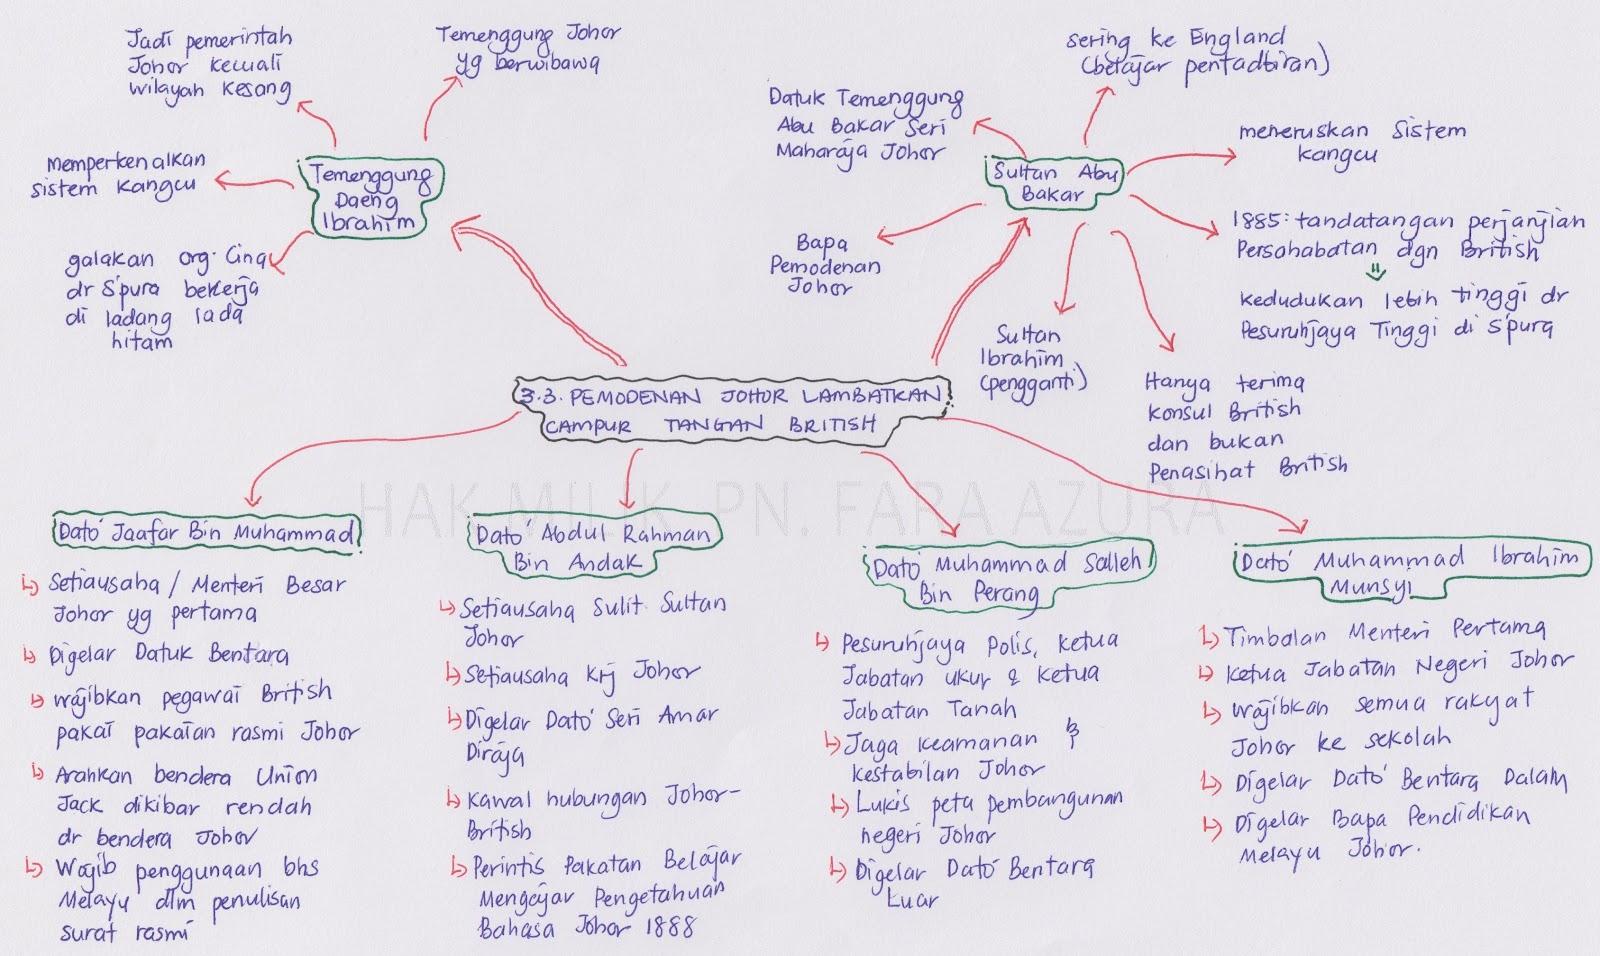 Peta Minda Ringkas Sejarah Tingkatan 3 Bab